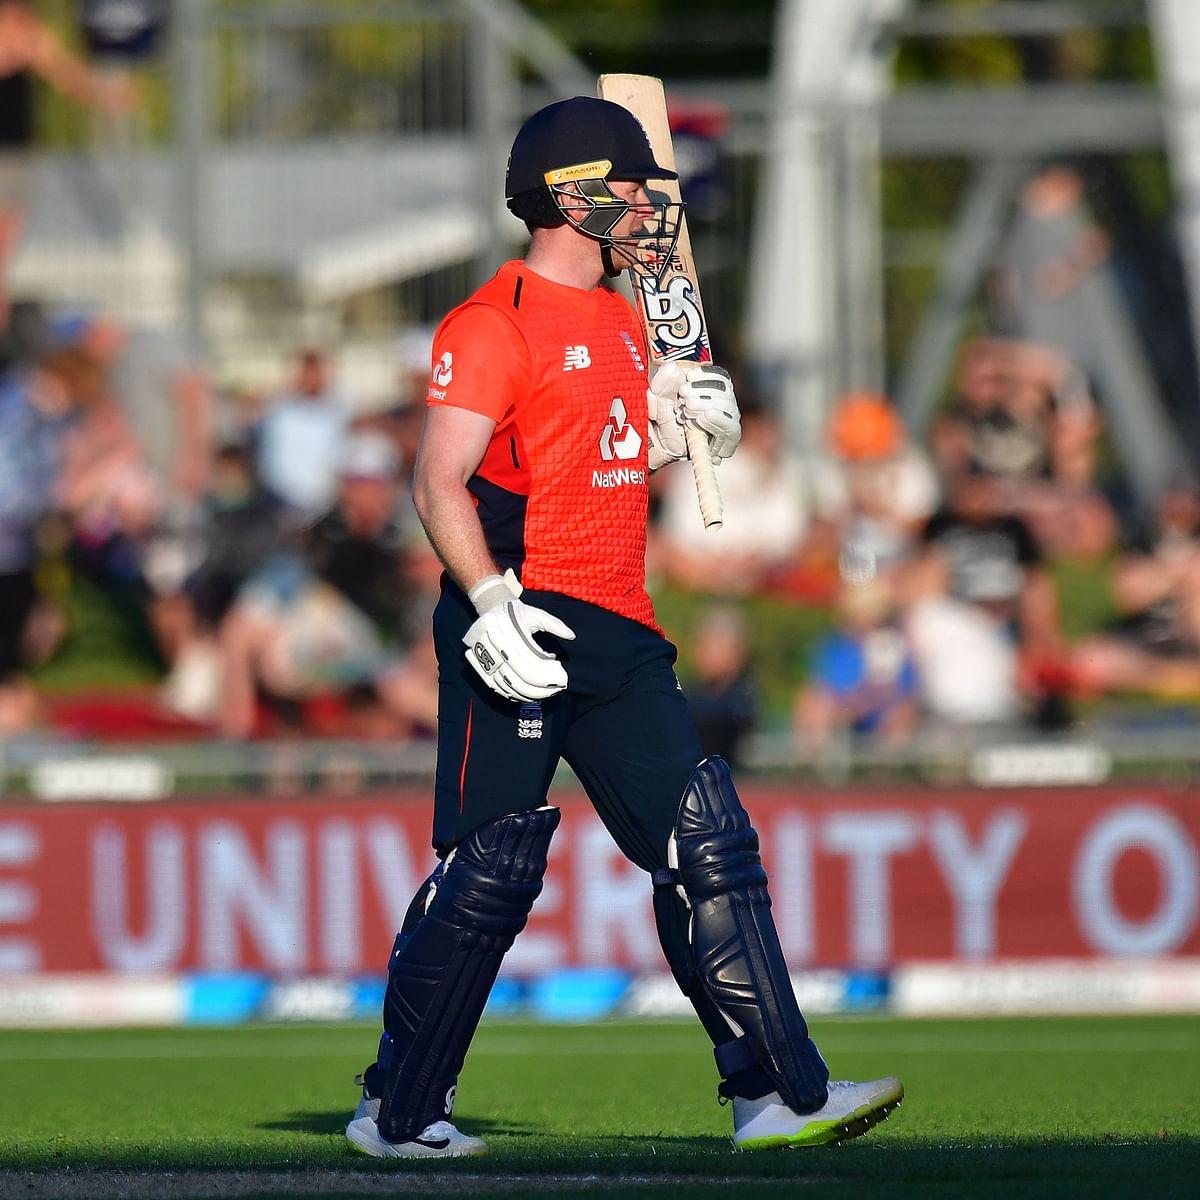 Eoin Morgan first England player to score 2000 T20I runs